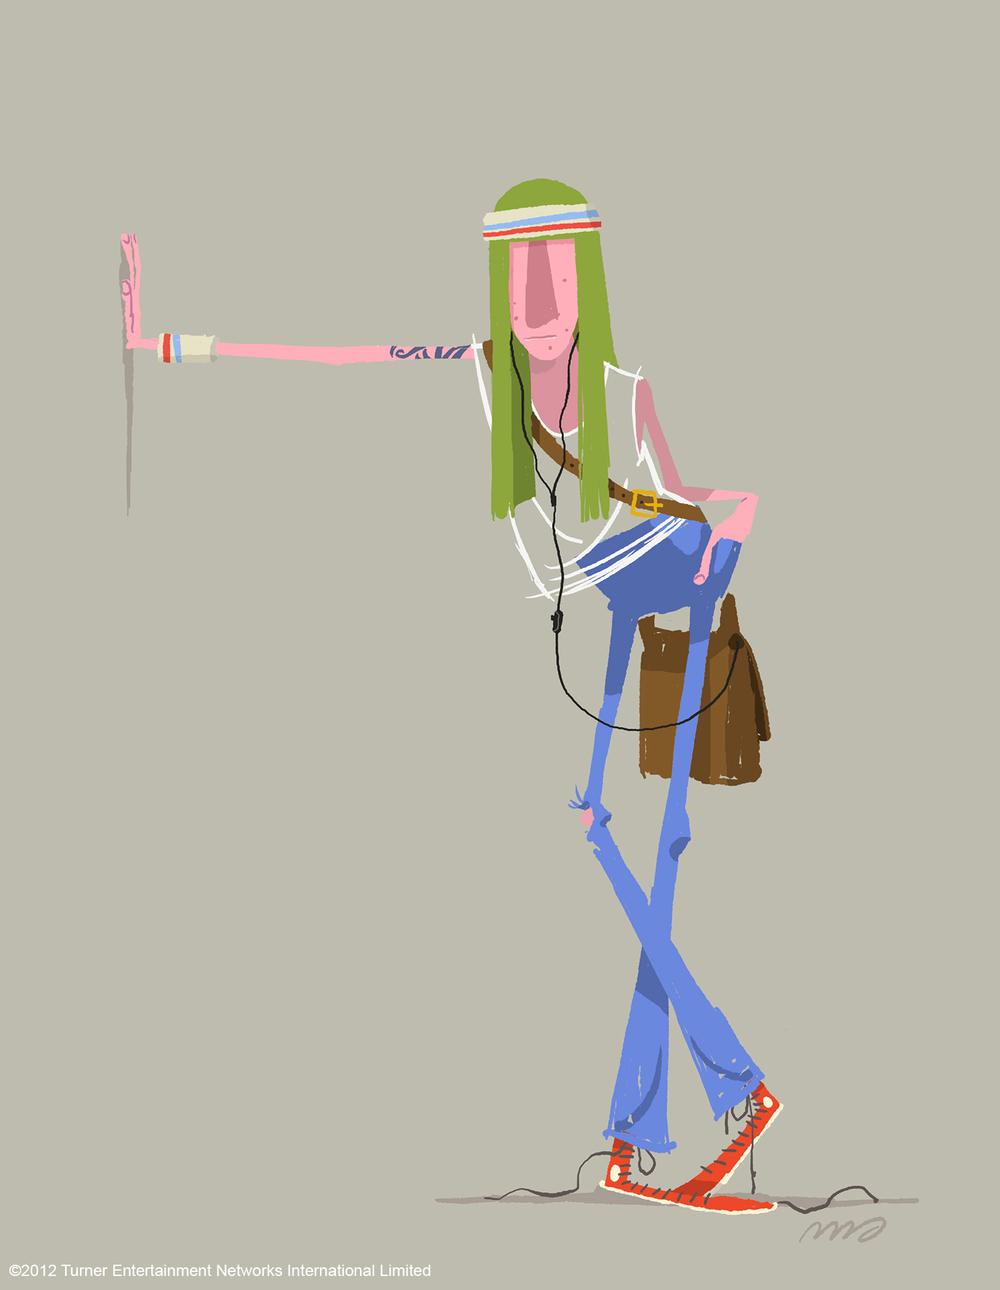 smarc-Pinky-dizzy01.jpg